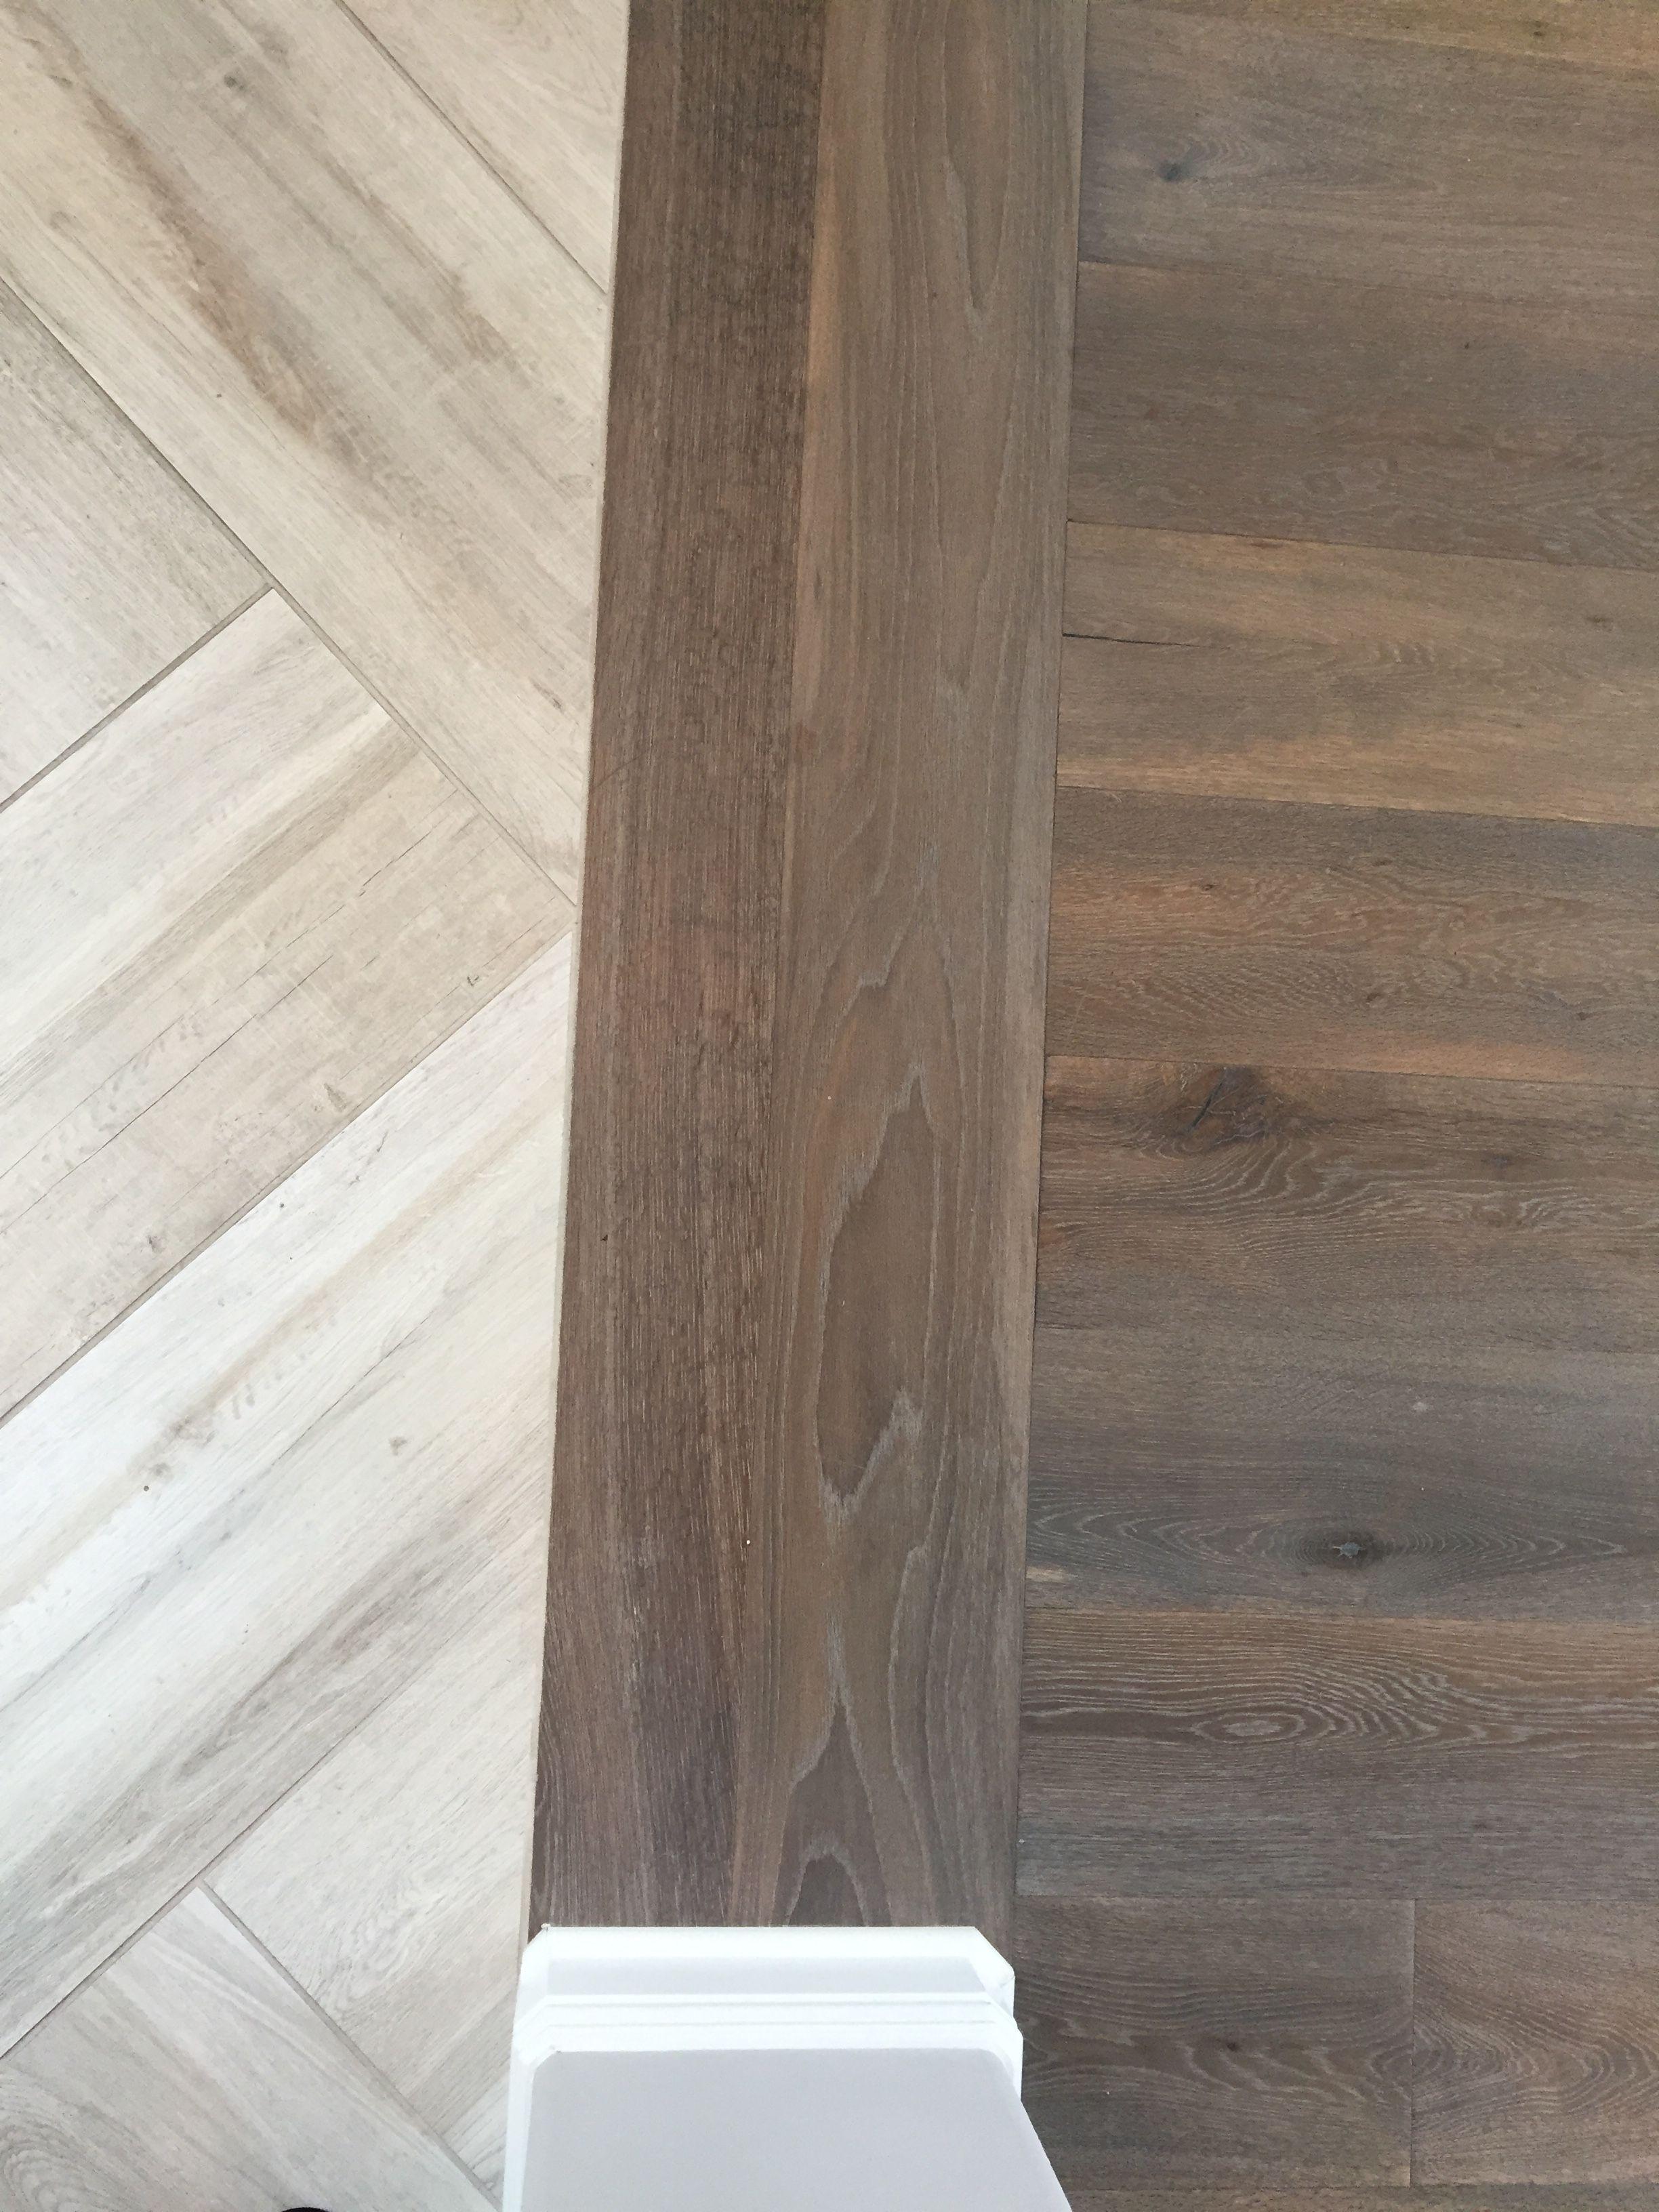 diy hardwood floor cost of floor transition laminate to herringbone tile pattern model throughout floor transition laminate to herringbone tile pattern herringbone tile pattern herringbone wood floor